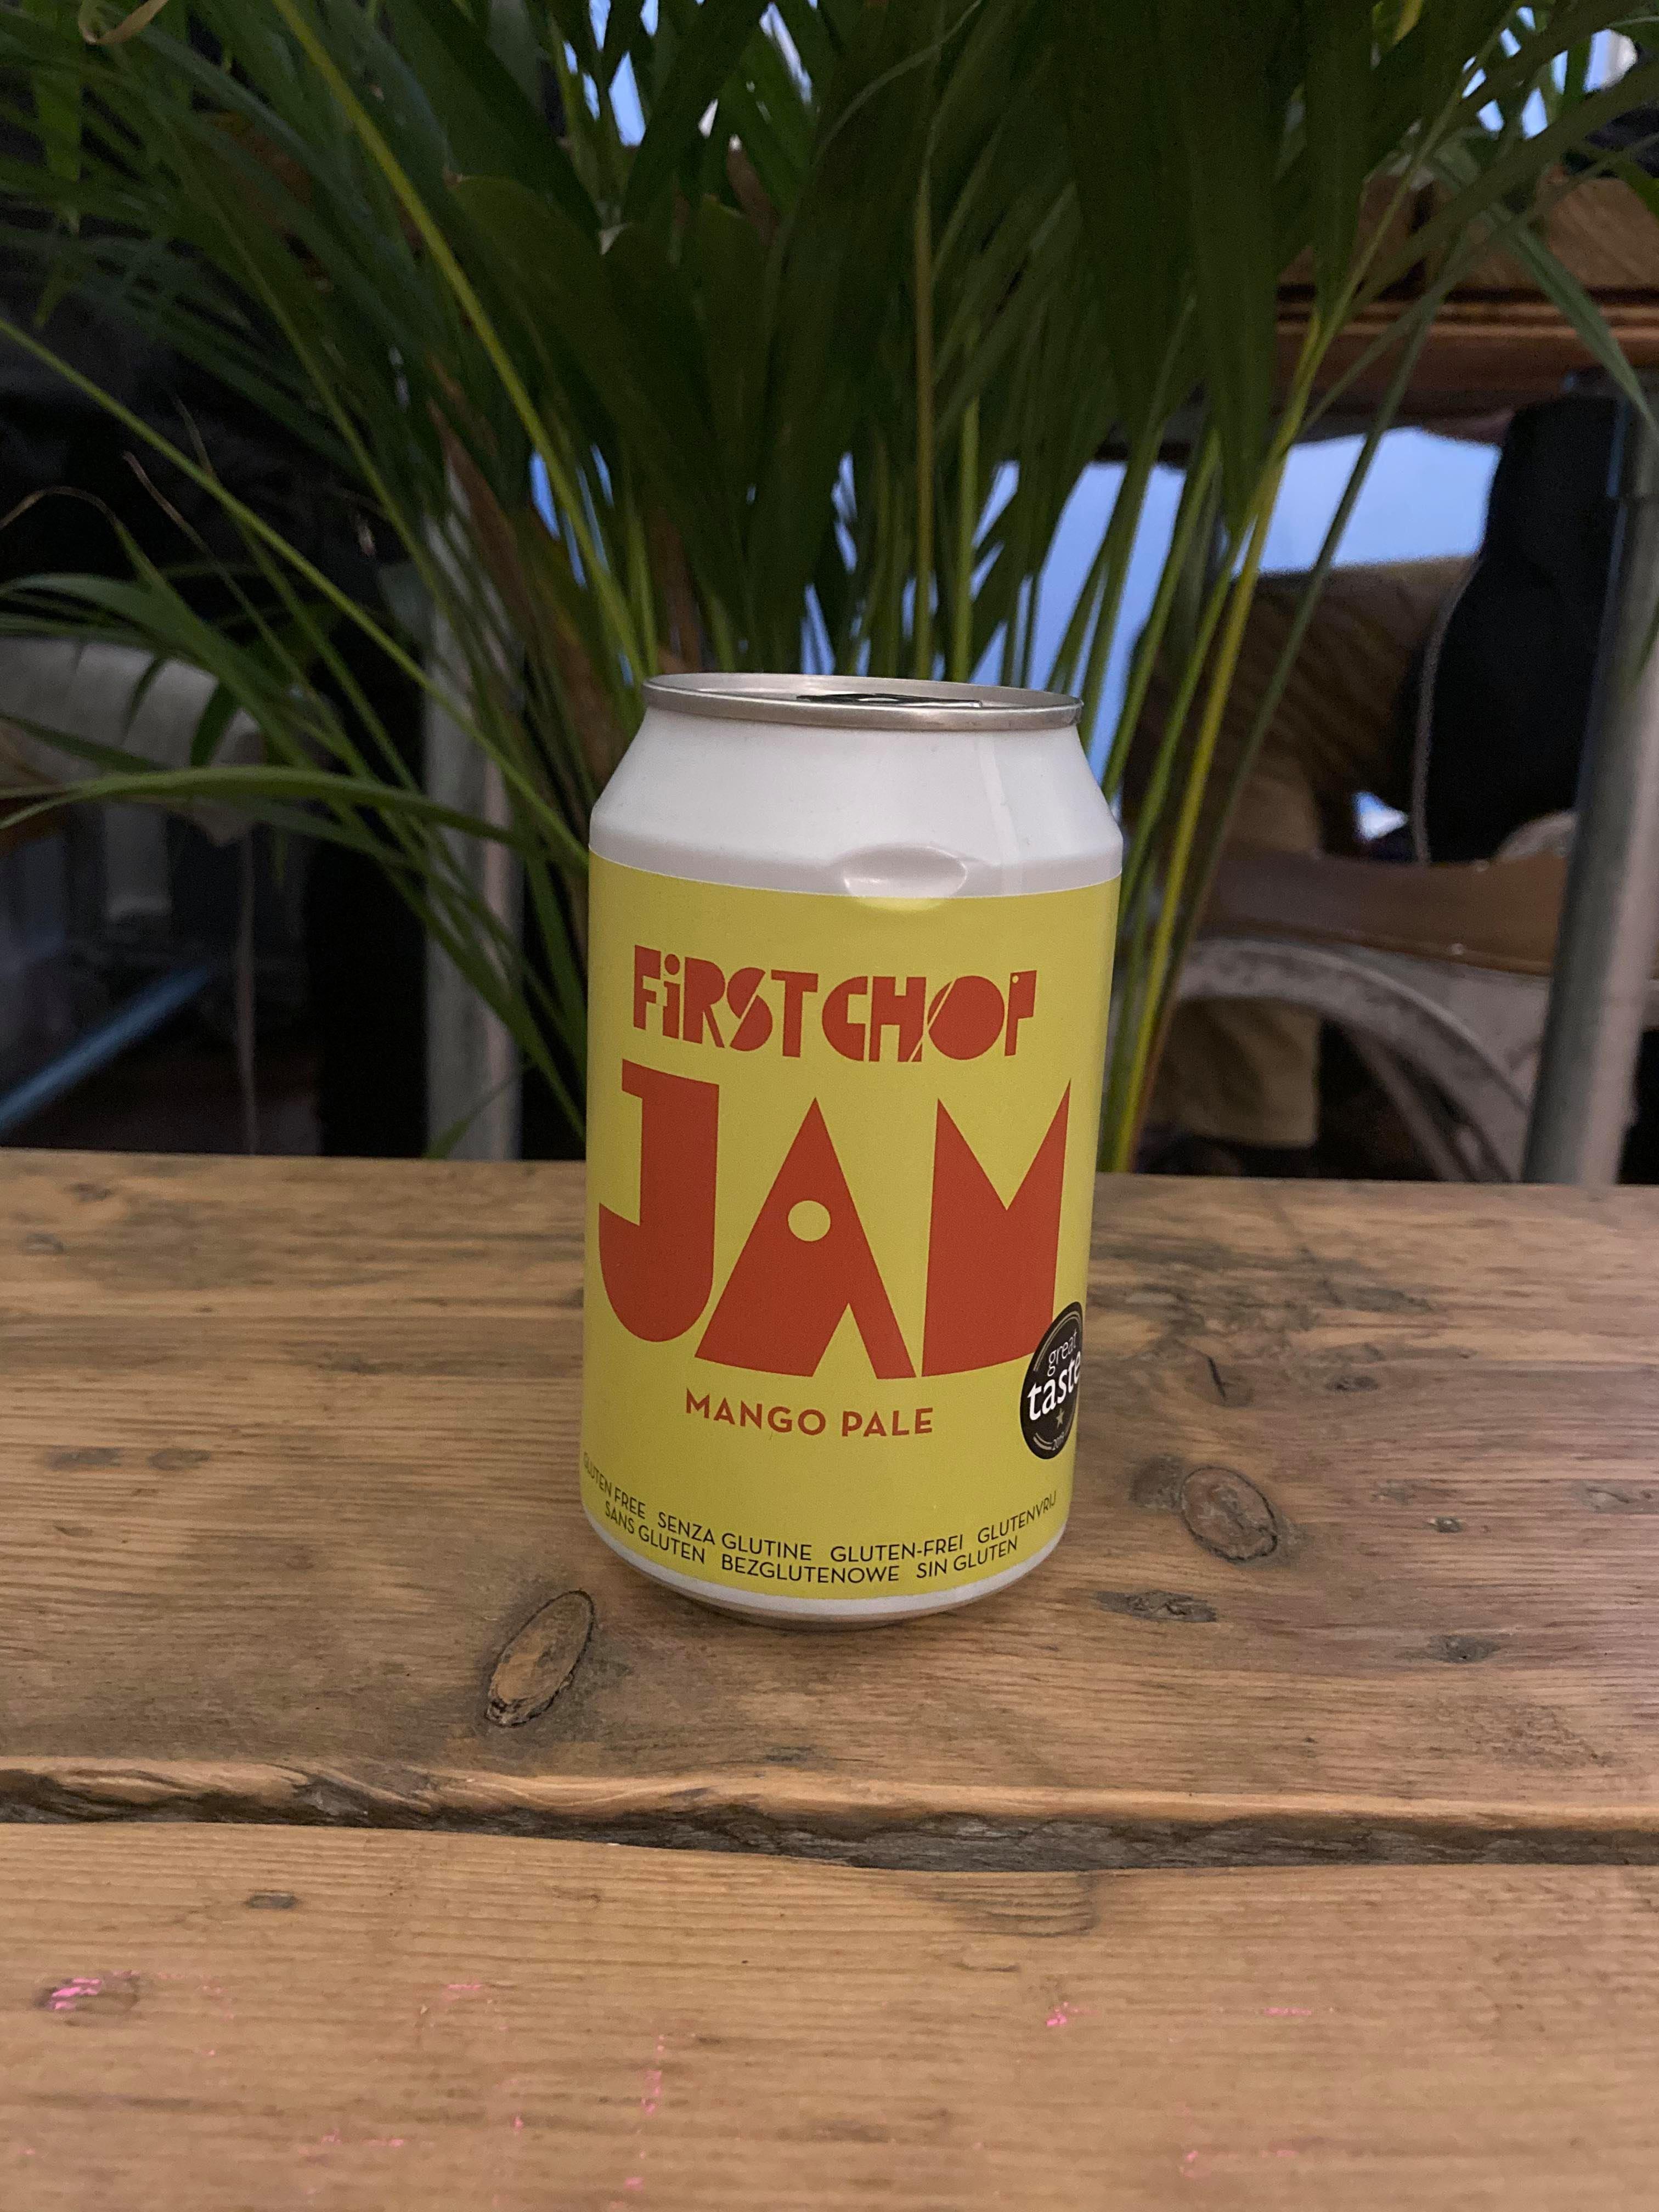 First Chop - Jam 4% (GF)